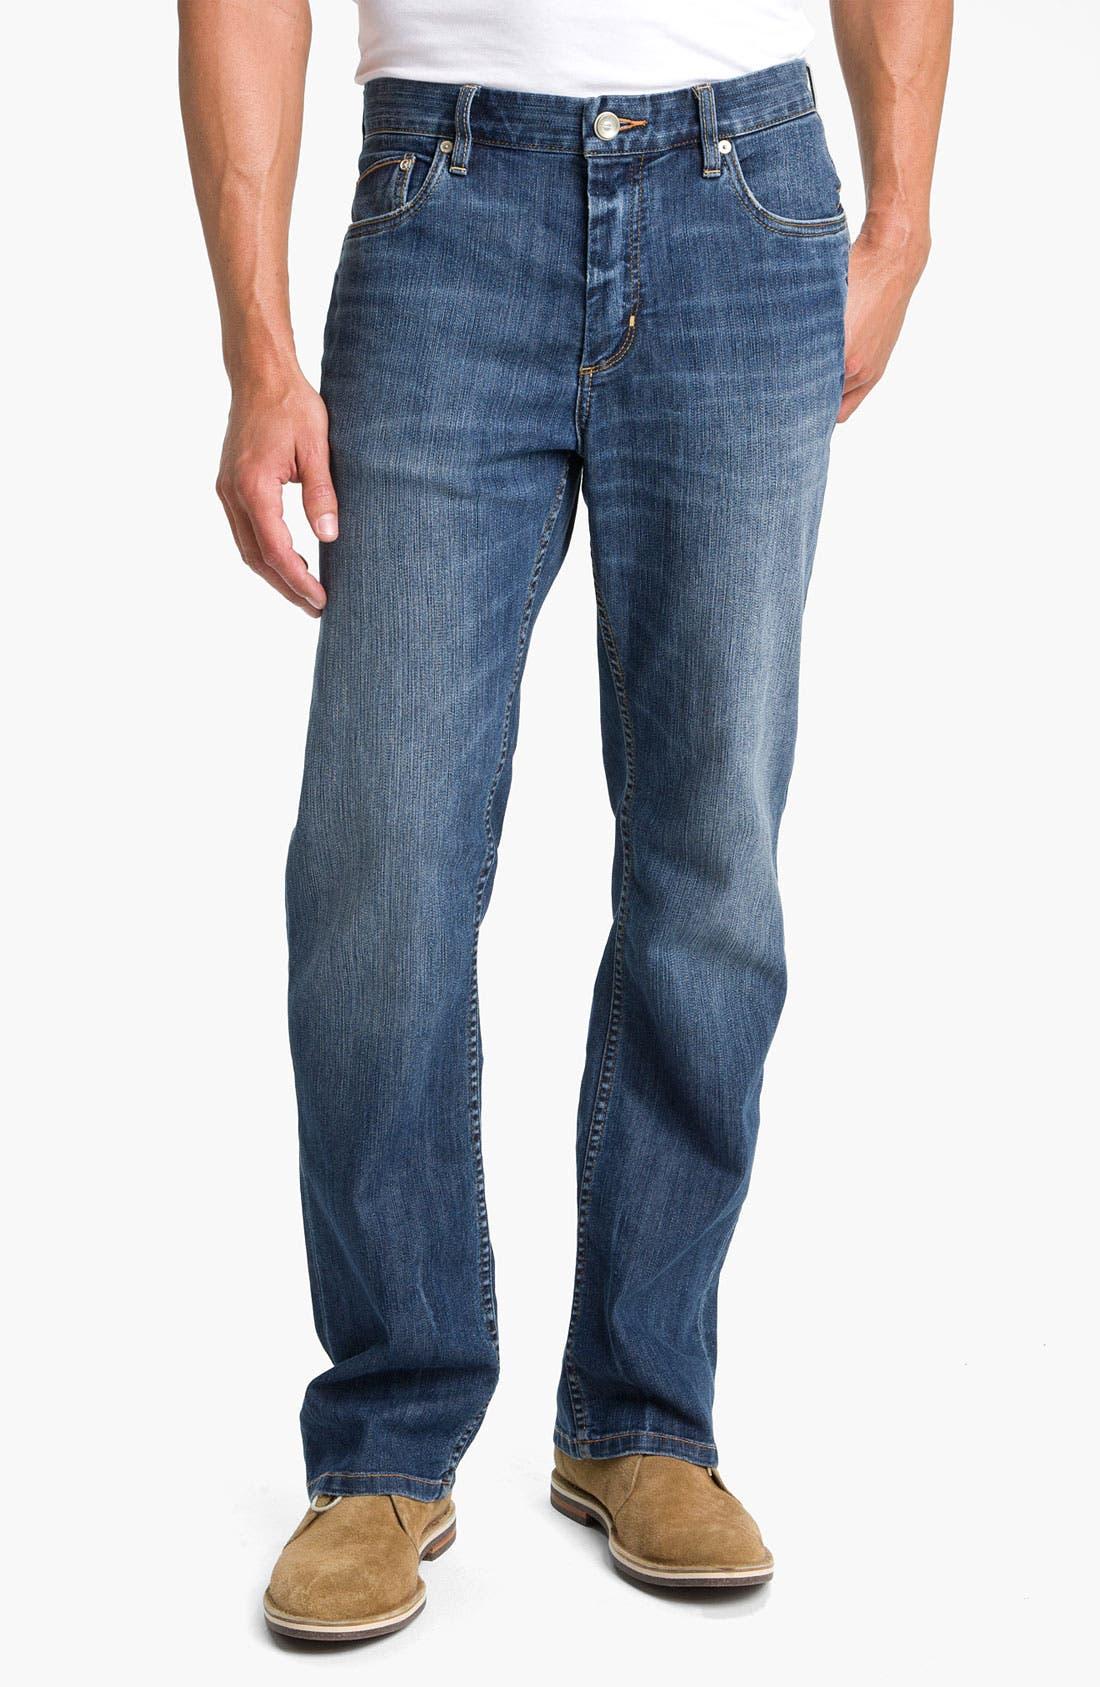 Alternate Image 1 Selected - Tommy Bahama Denim 'Kingsly' Standard Fit Straight Leg Jeans (Medium Coastal)